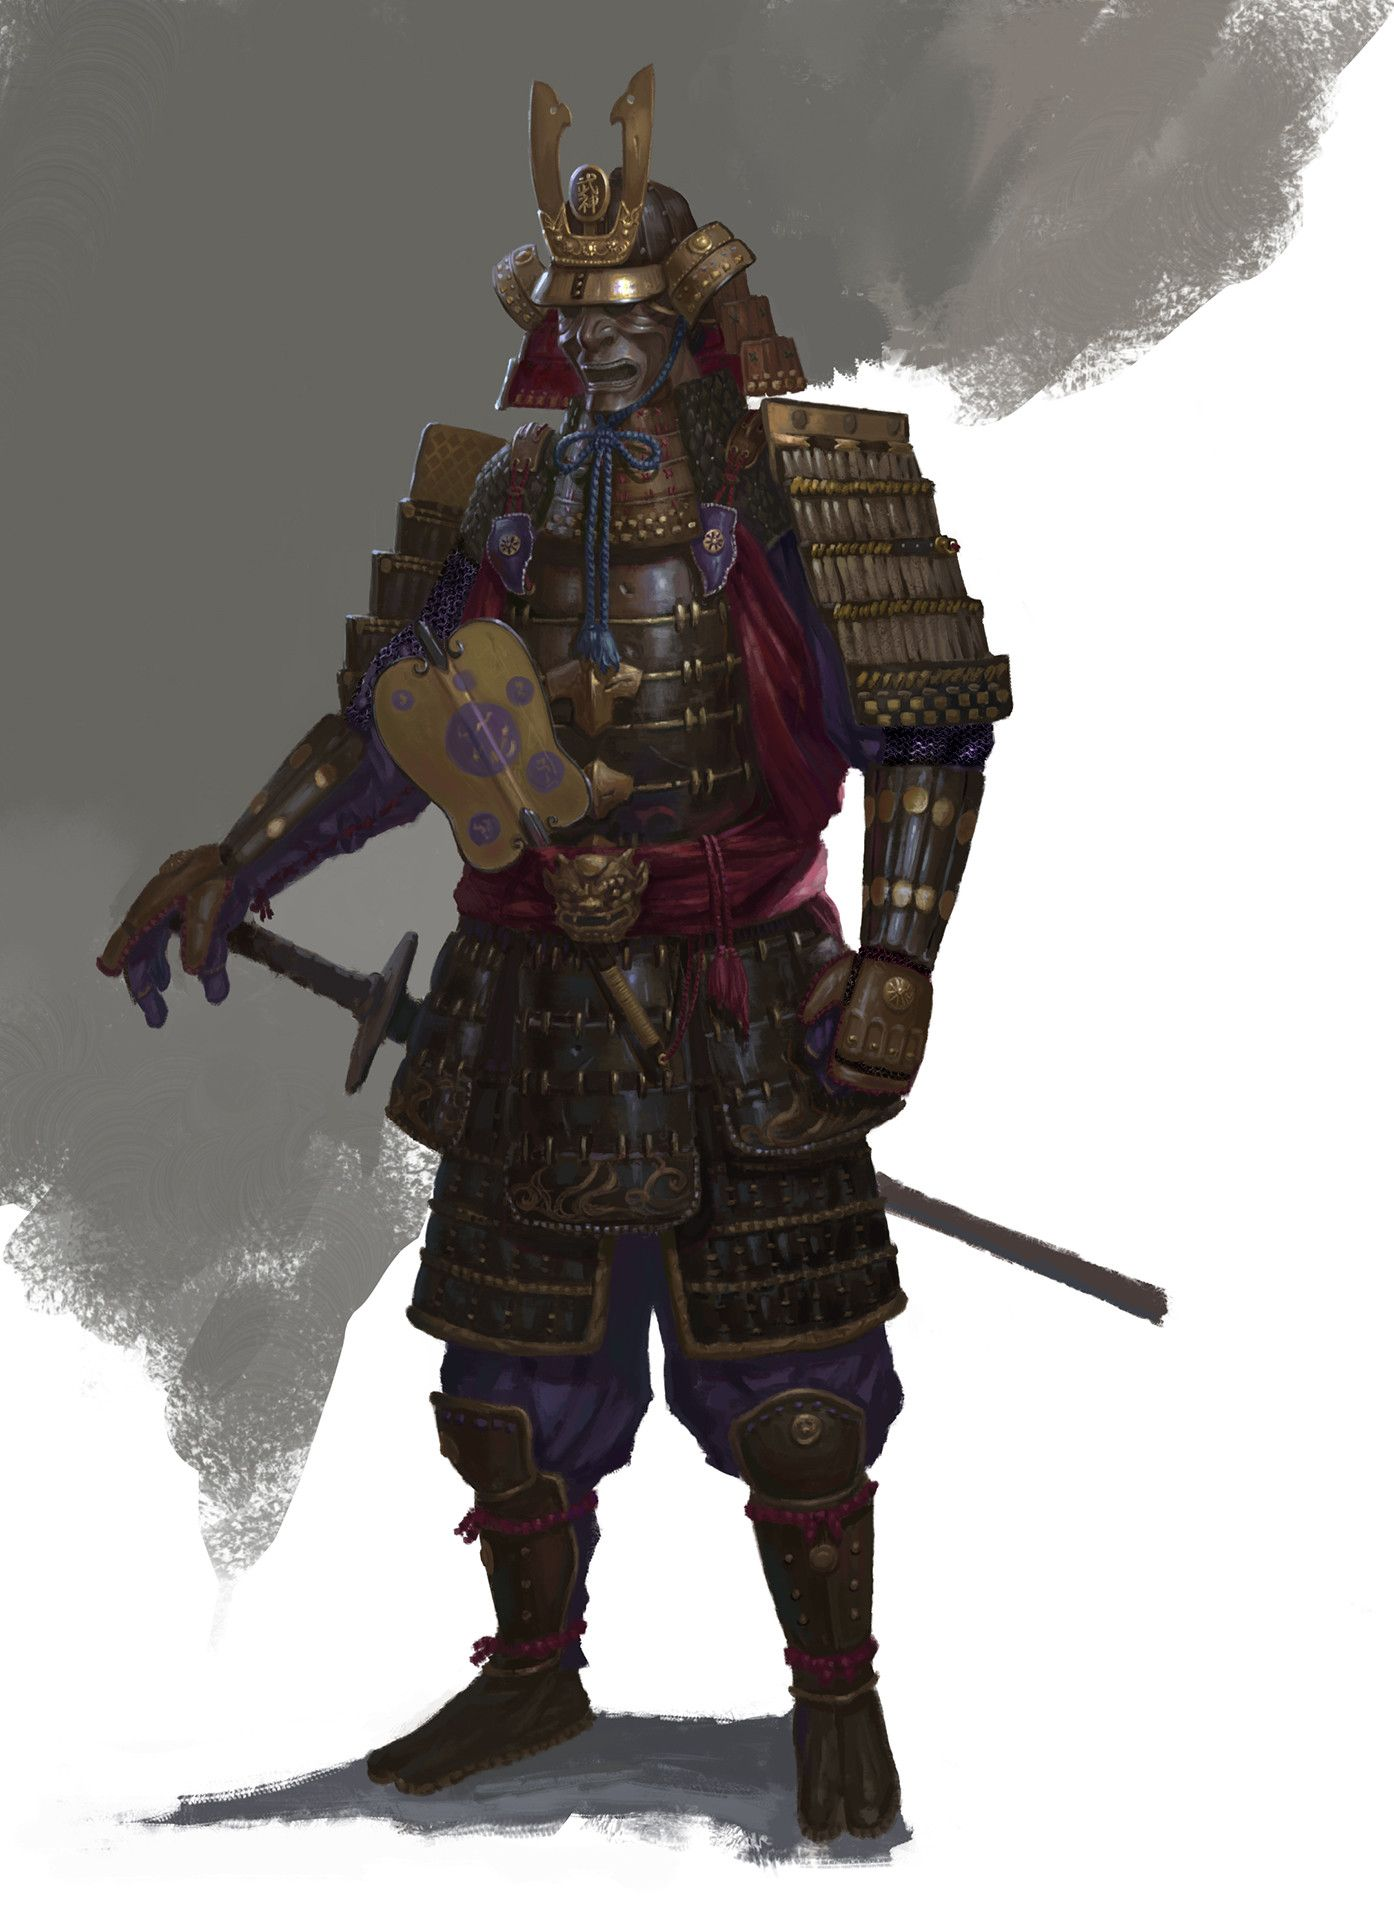 ArtStation - Design, xx r | Historical & Fantasy | Samurai ...  ArtStation - De...